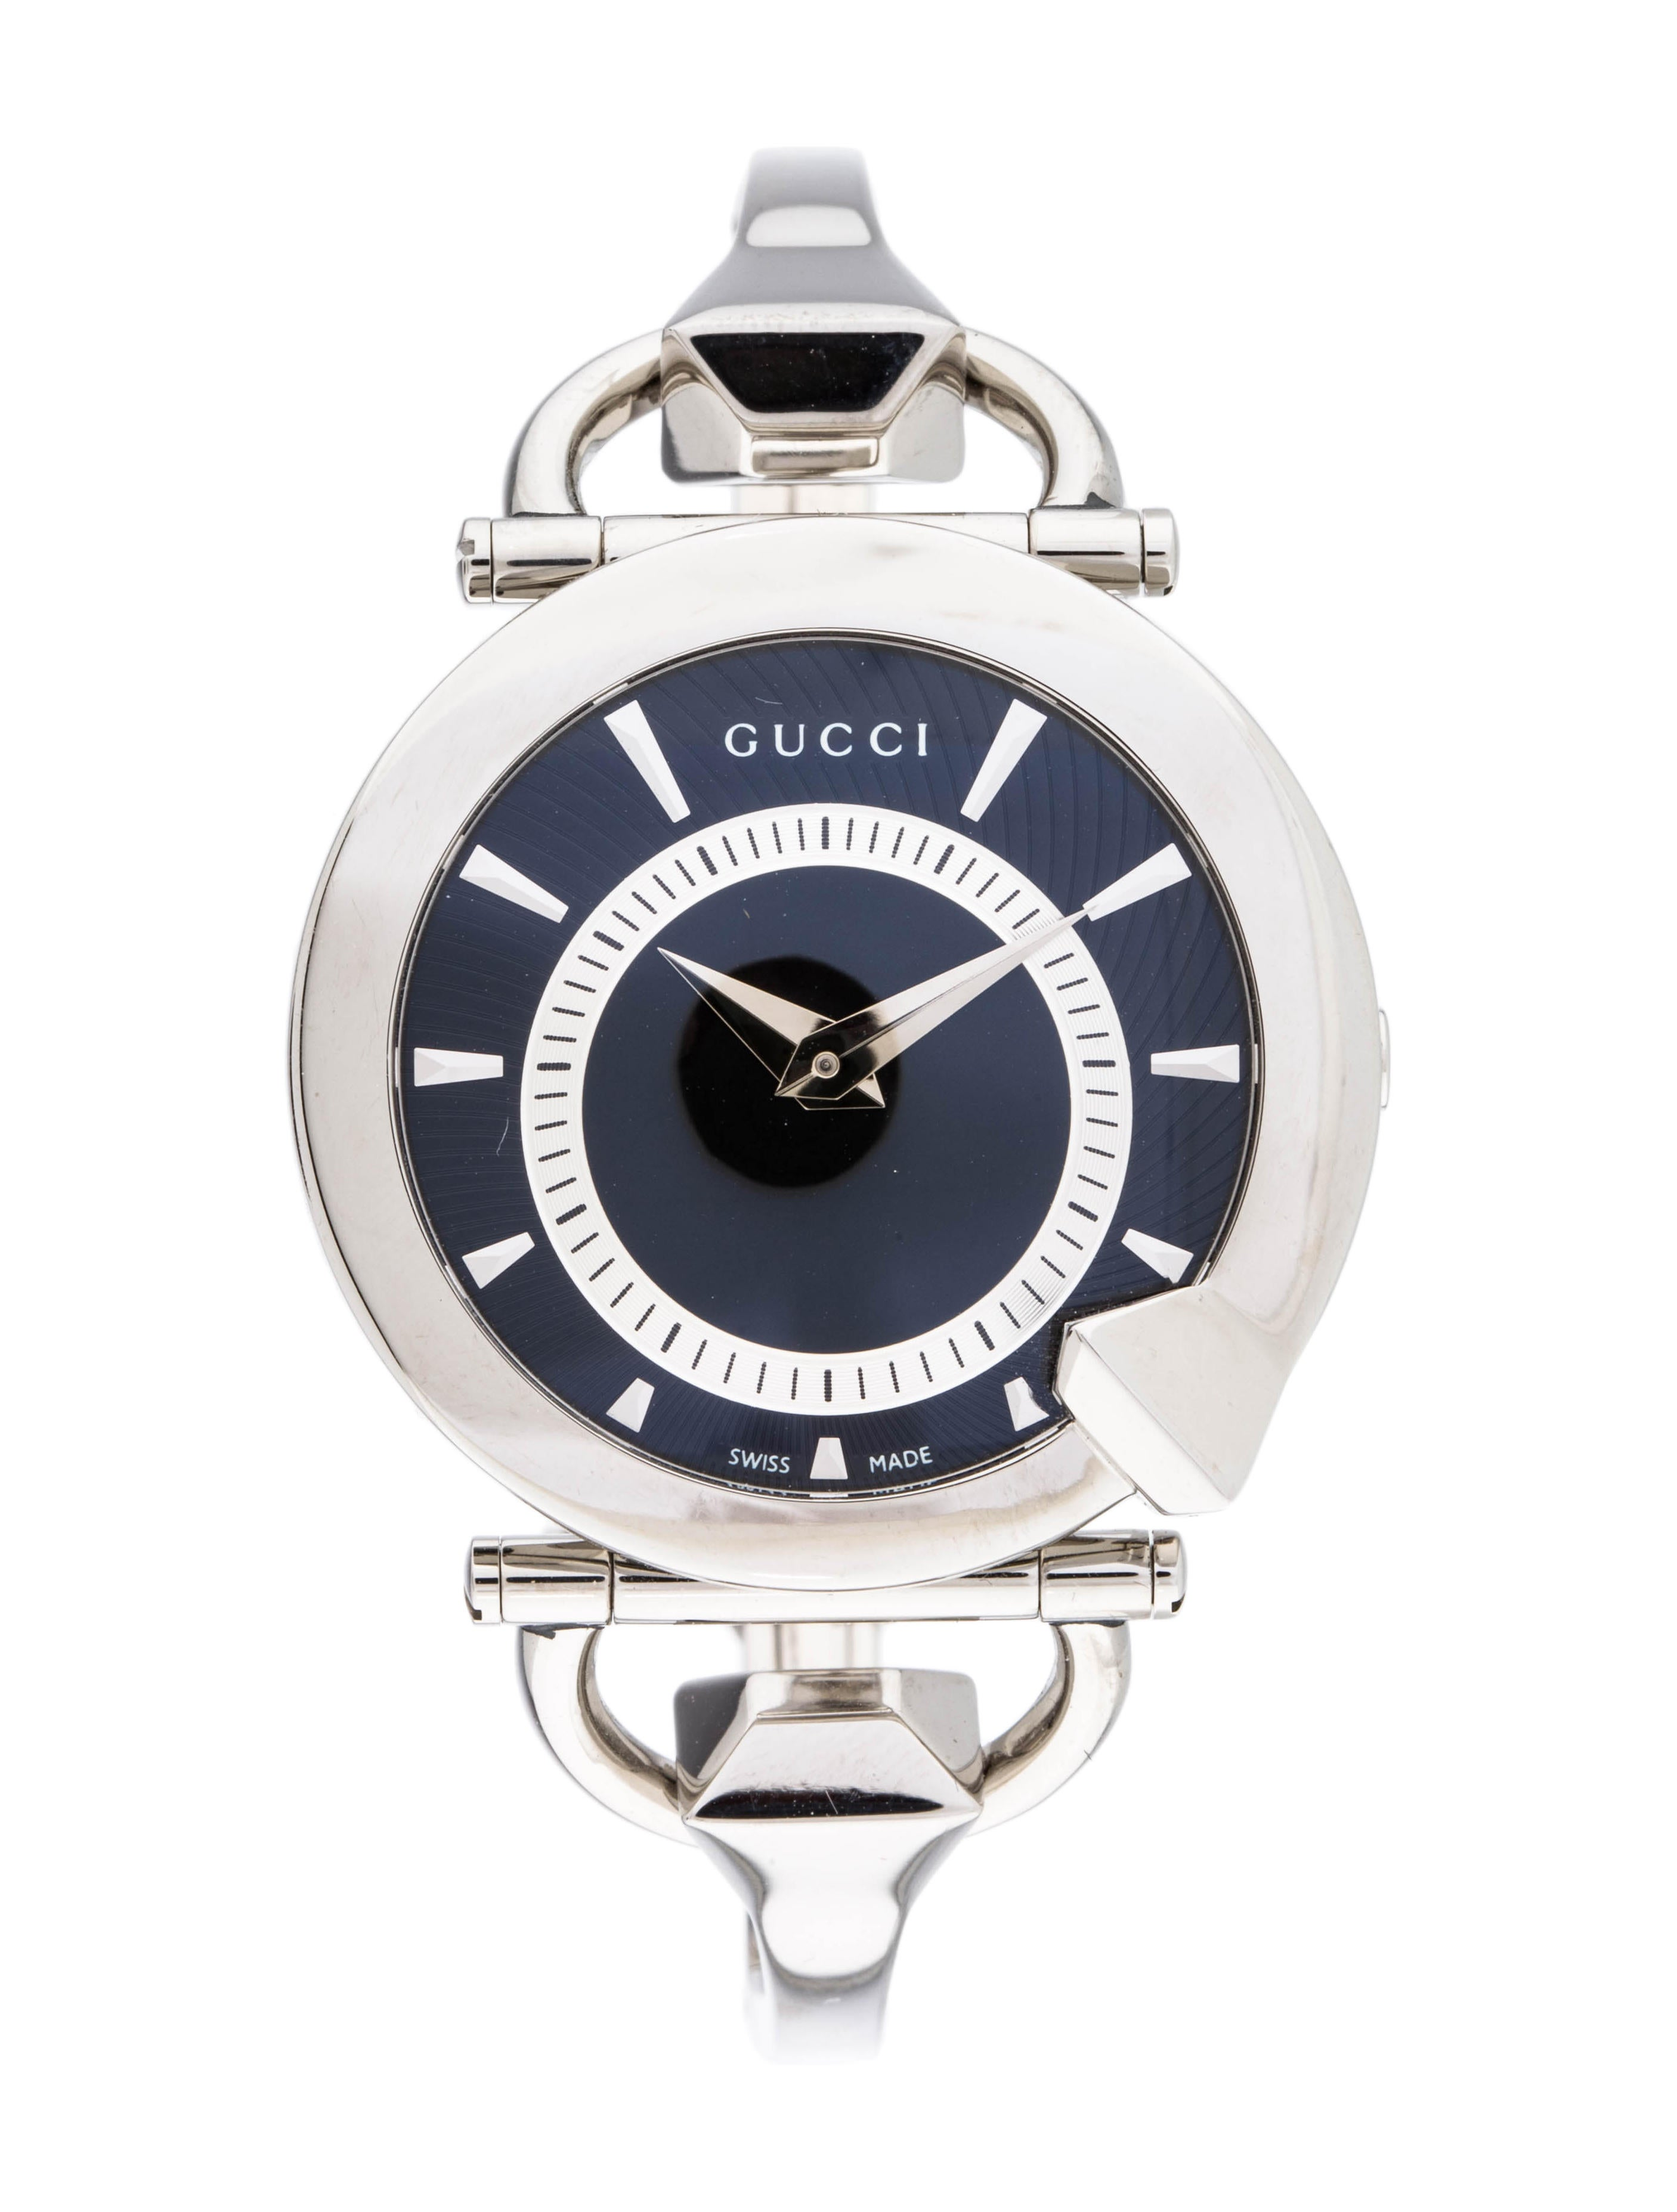 fe38f1e3def Gucci Chiodo Watch - Bracelet - GUC279825